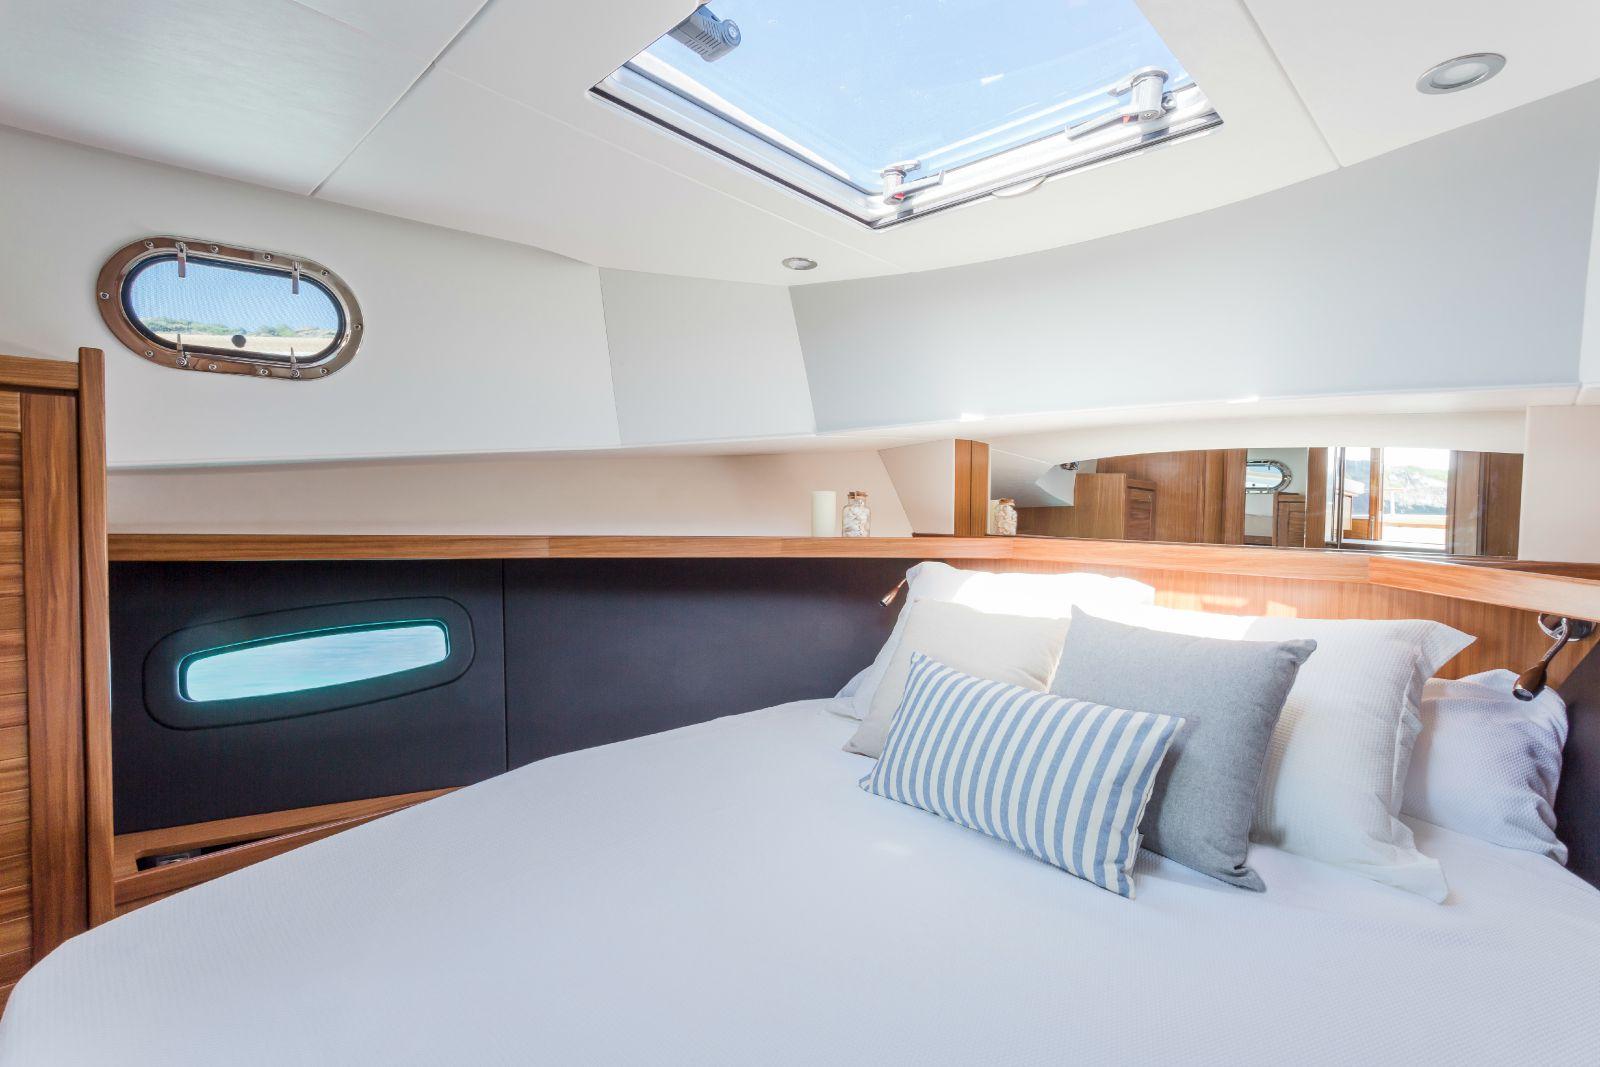 Minorca Islander 34 for sale - Master Cabin